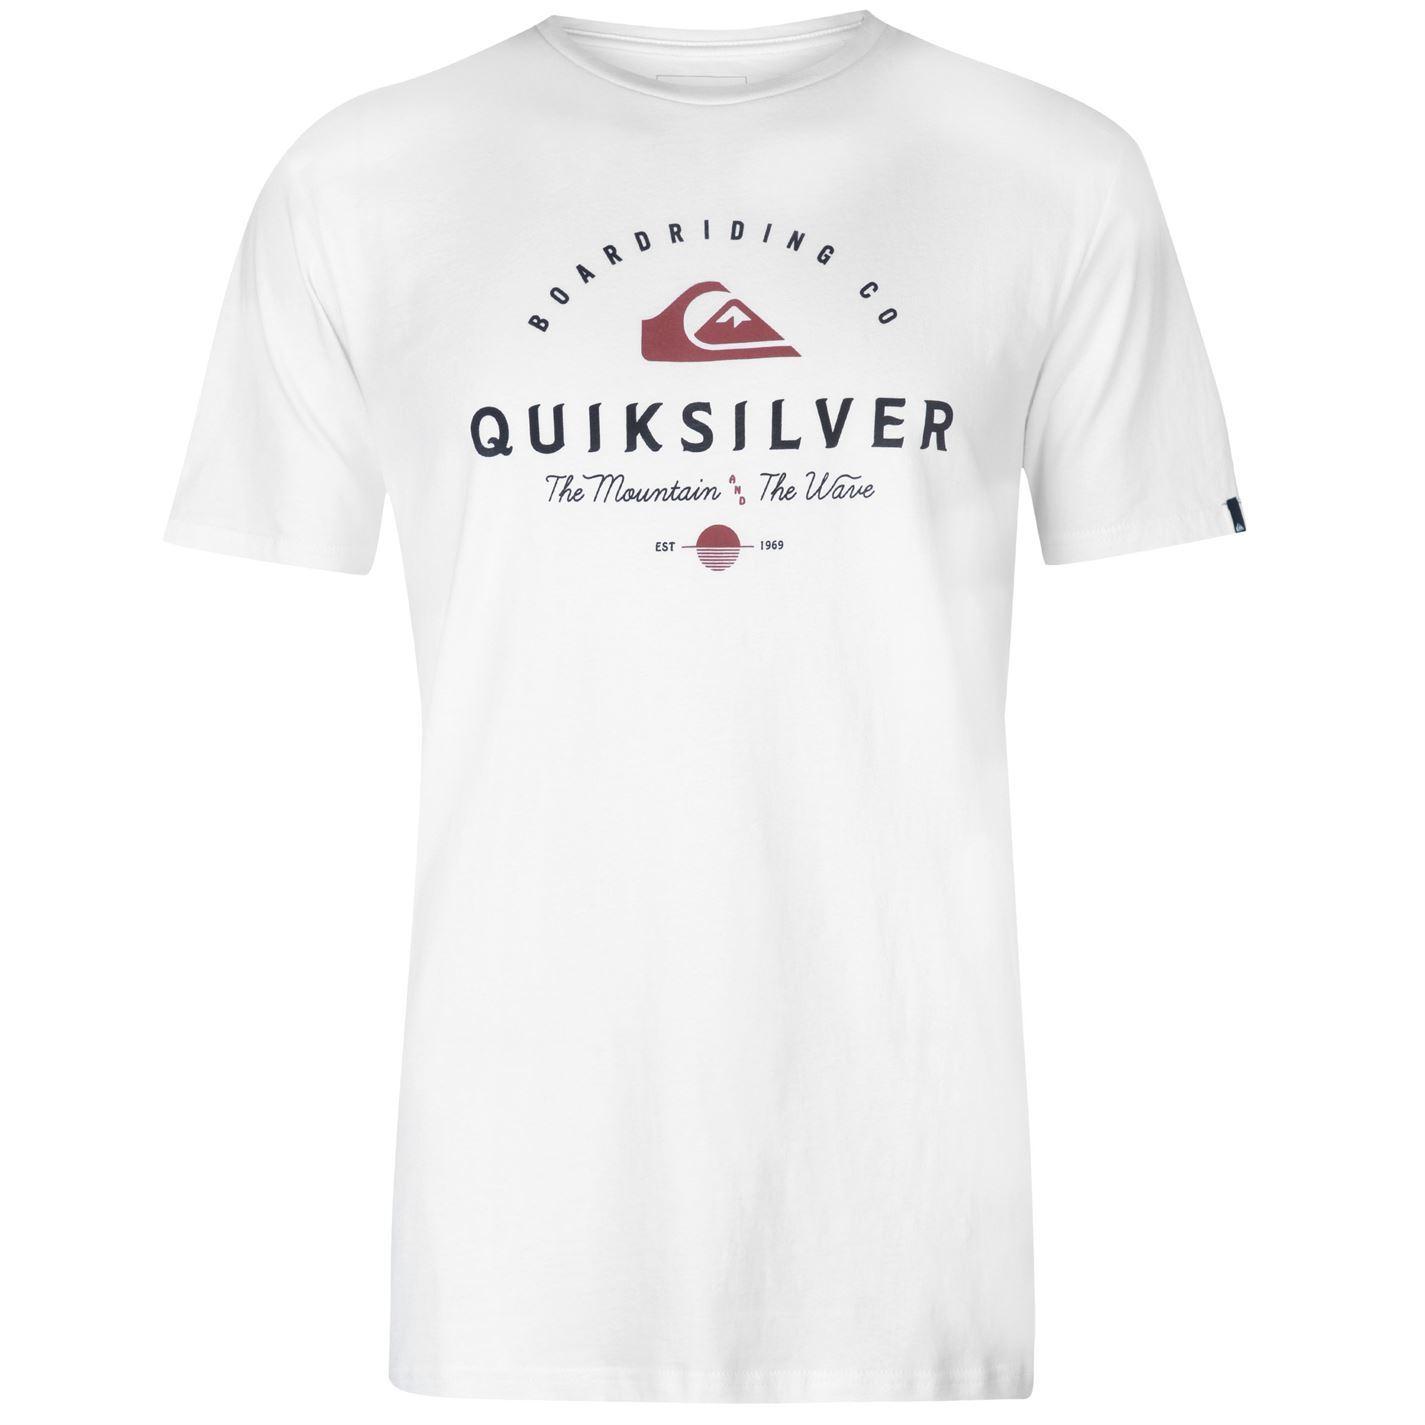 Quiksilver-Working-Man-T-Shirt-Mens-Tee-Shirt-Top thumbnail 9